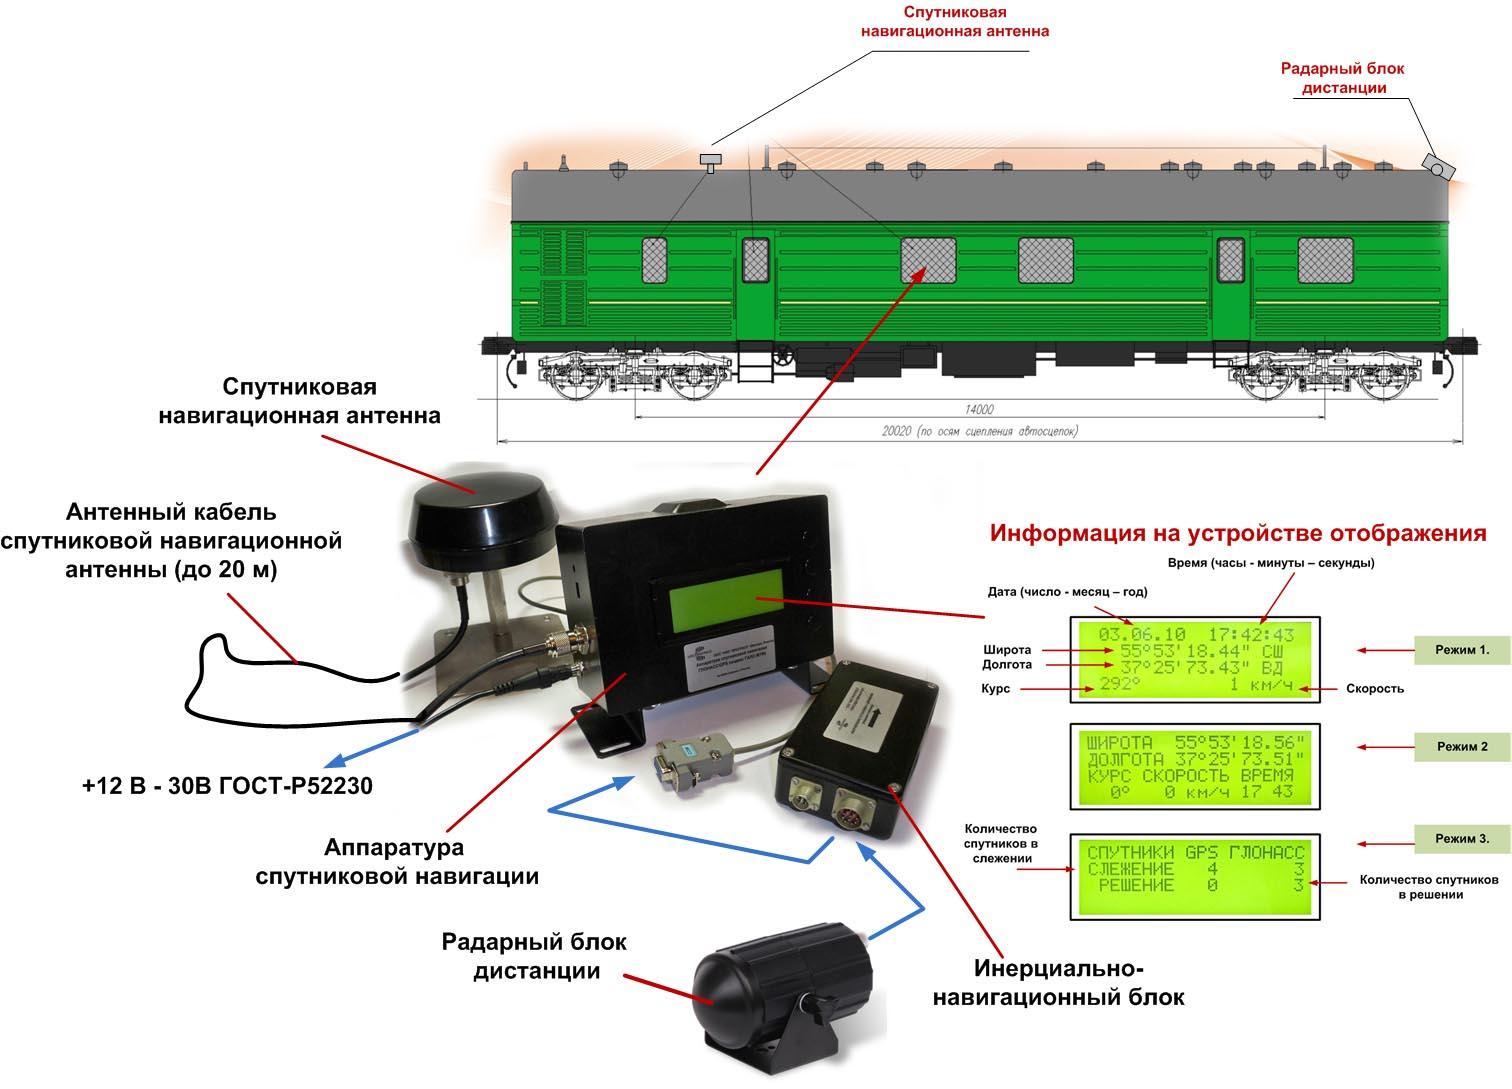 Аппаратура ГАЛС-М1М в изделии 15Т91<br>НПО ПРОГРЕСС (Москва.Россия).